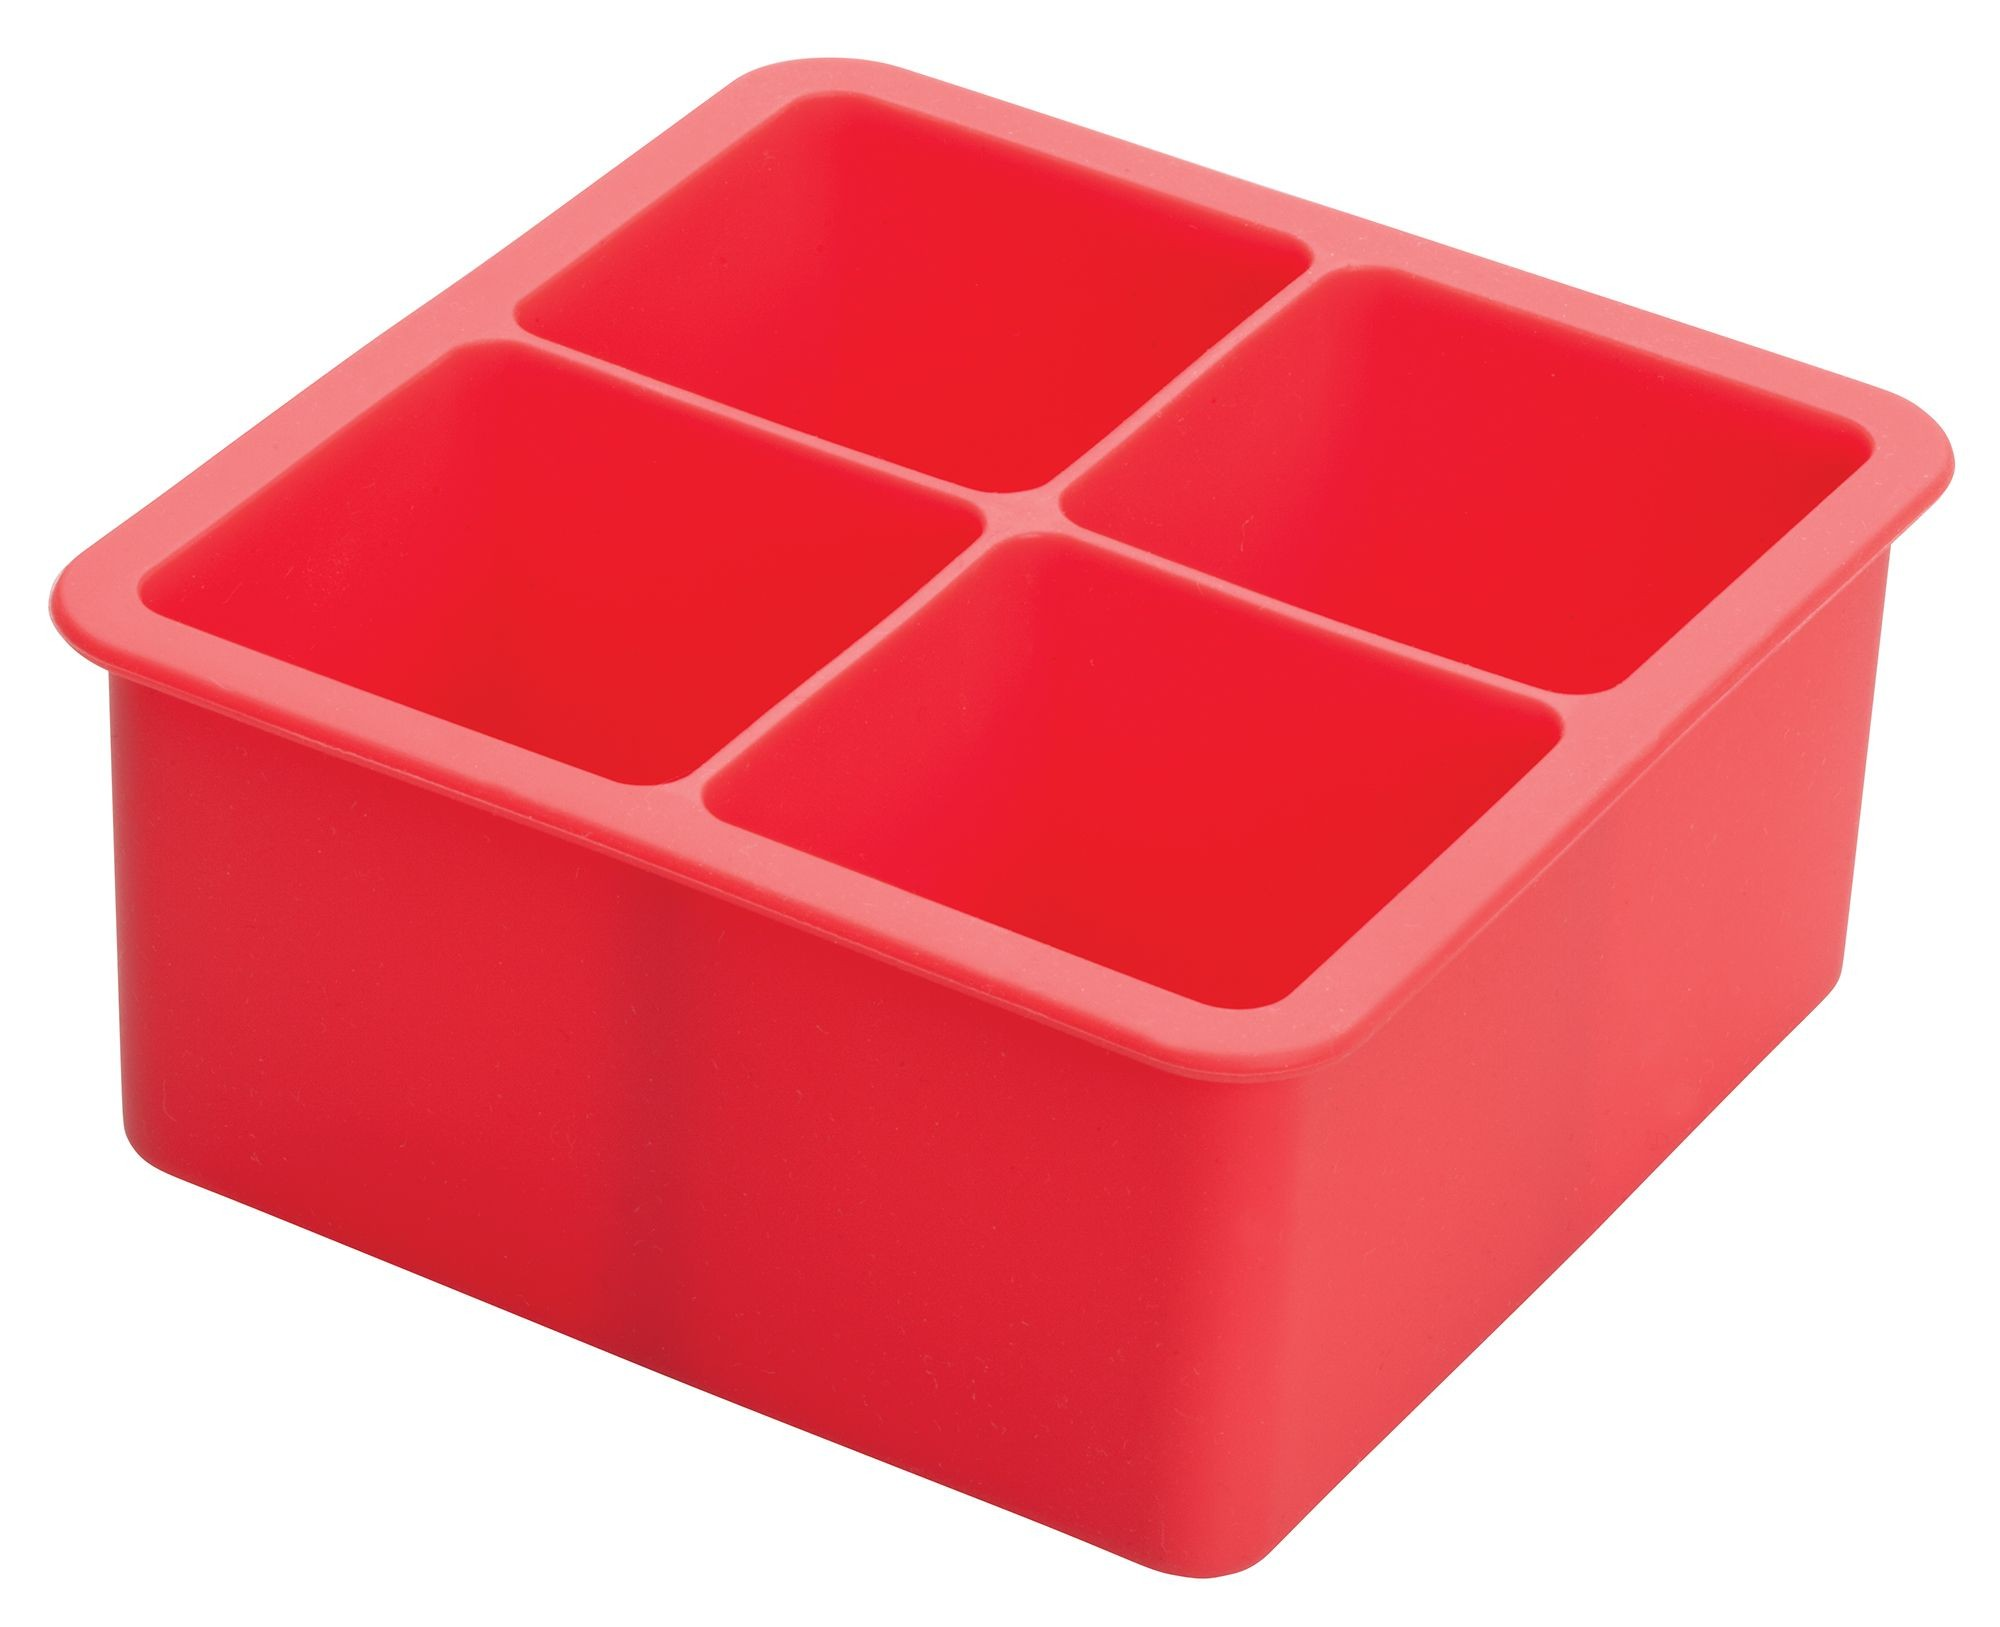 Winco ICCT-4R Silicone 4-Cube Ice Tray